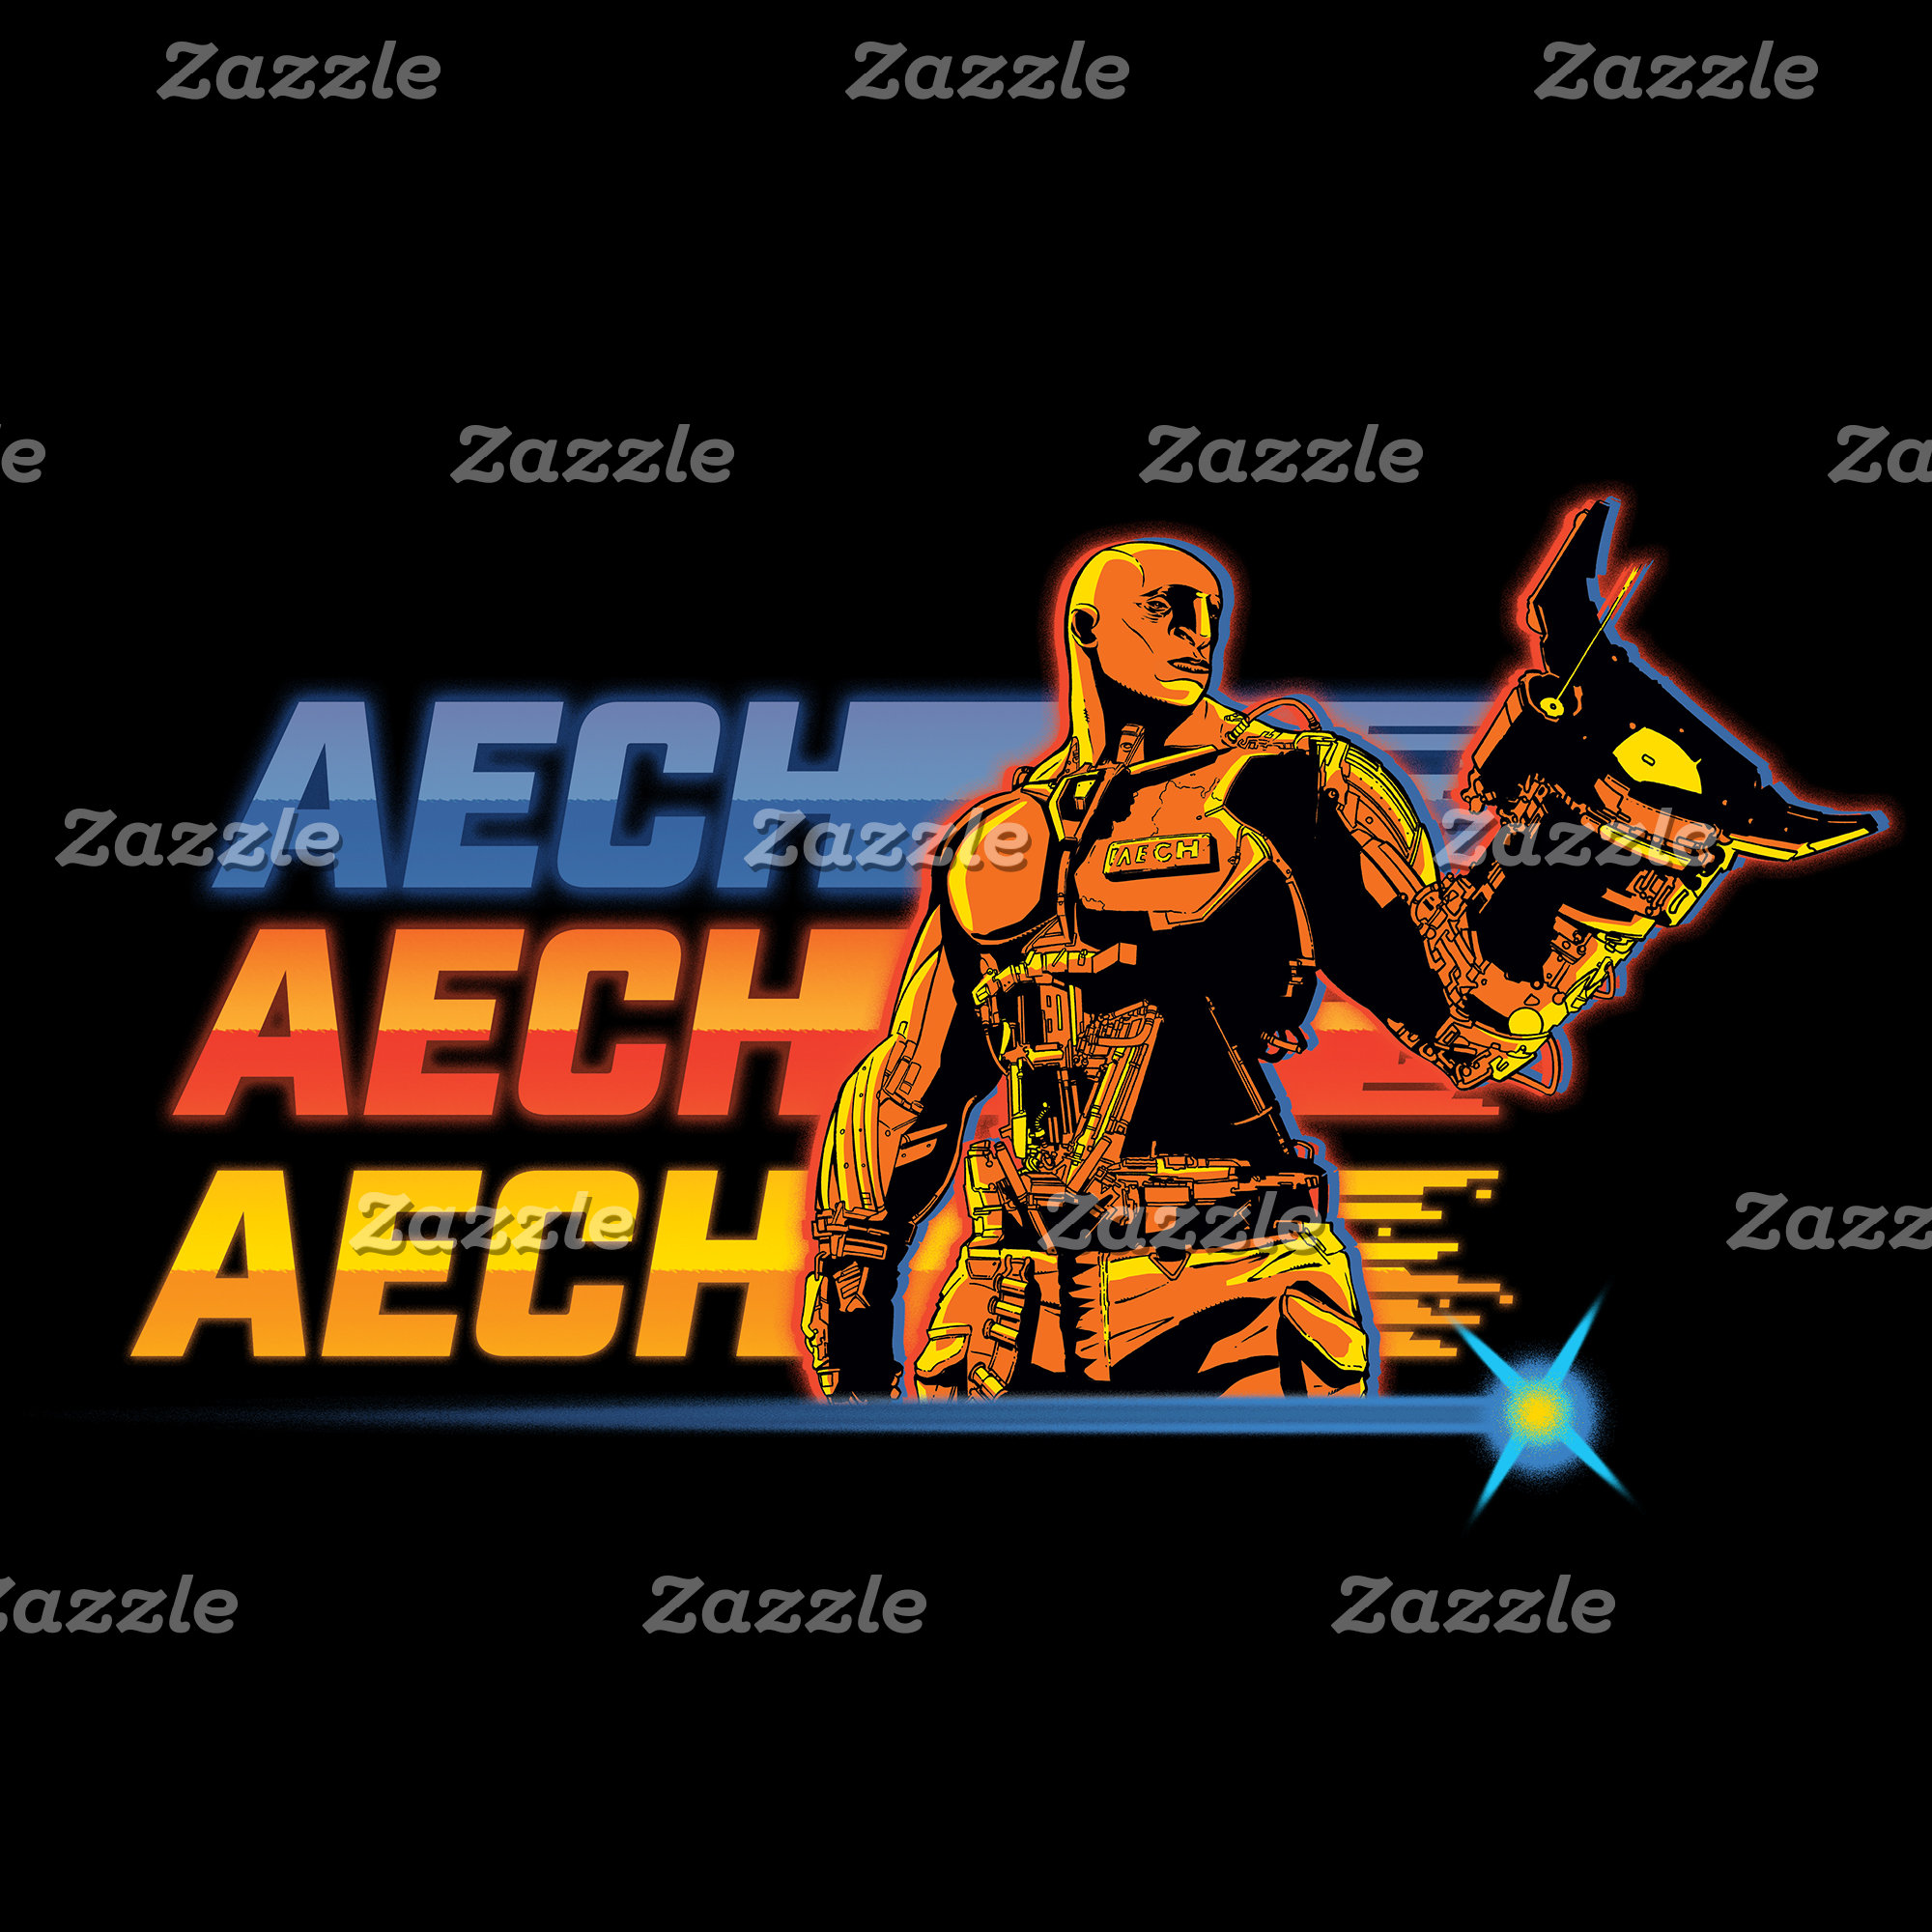 Aech Graphic